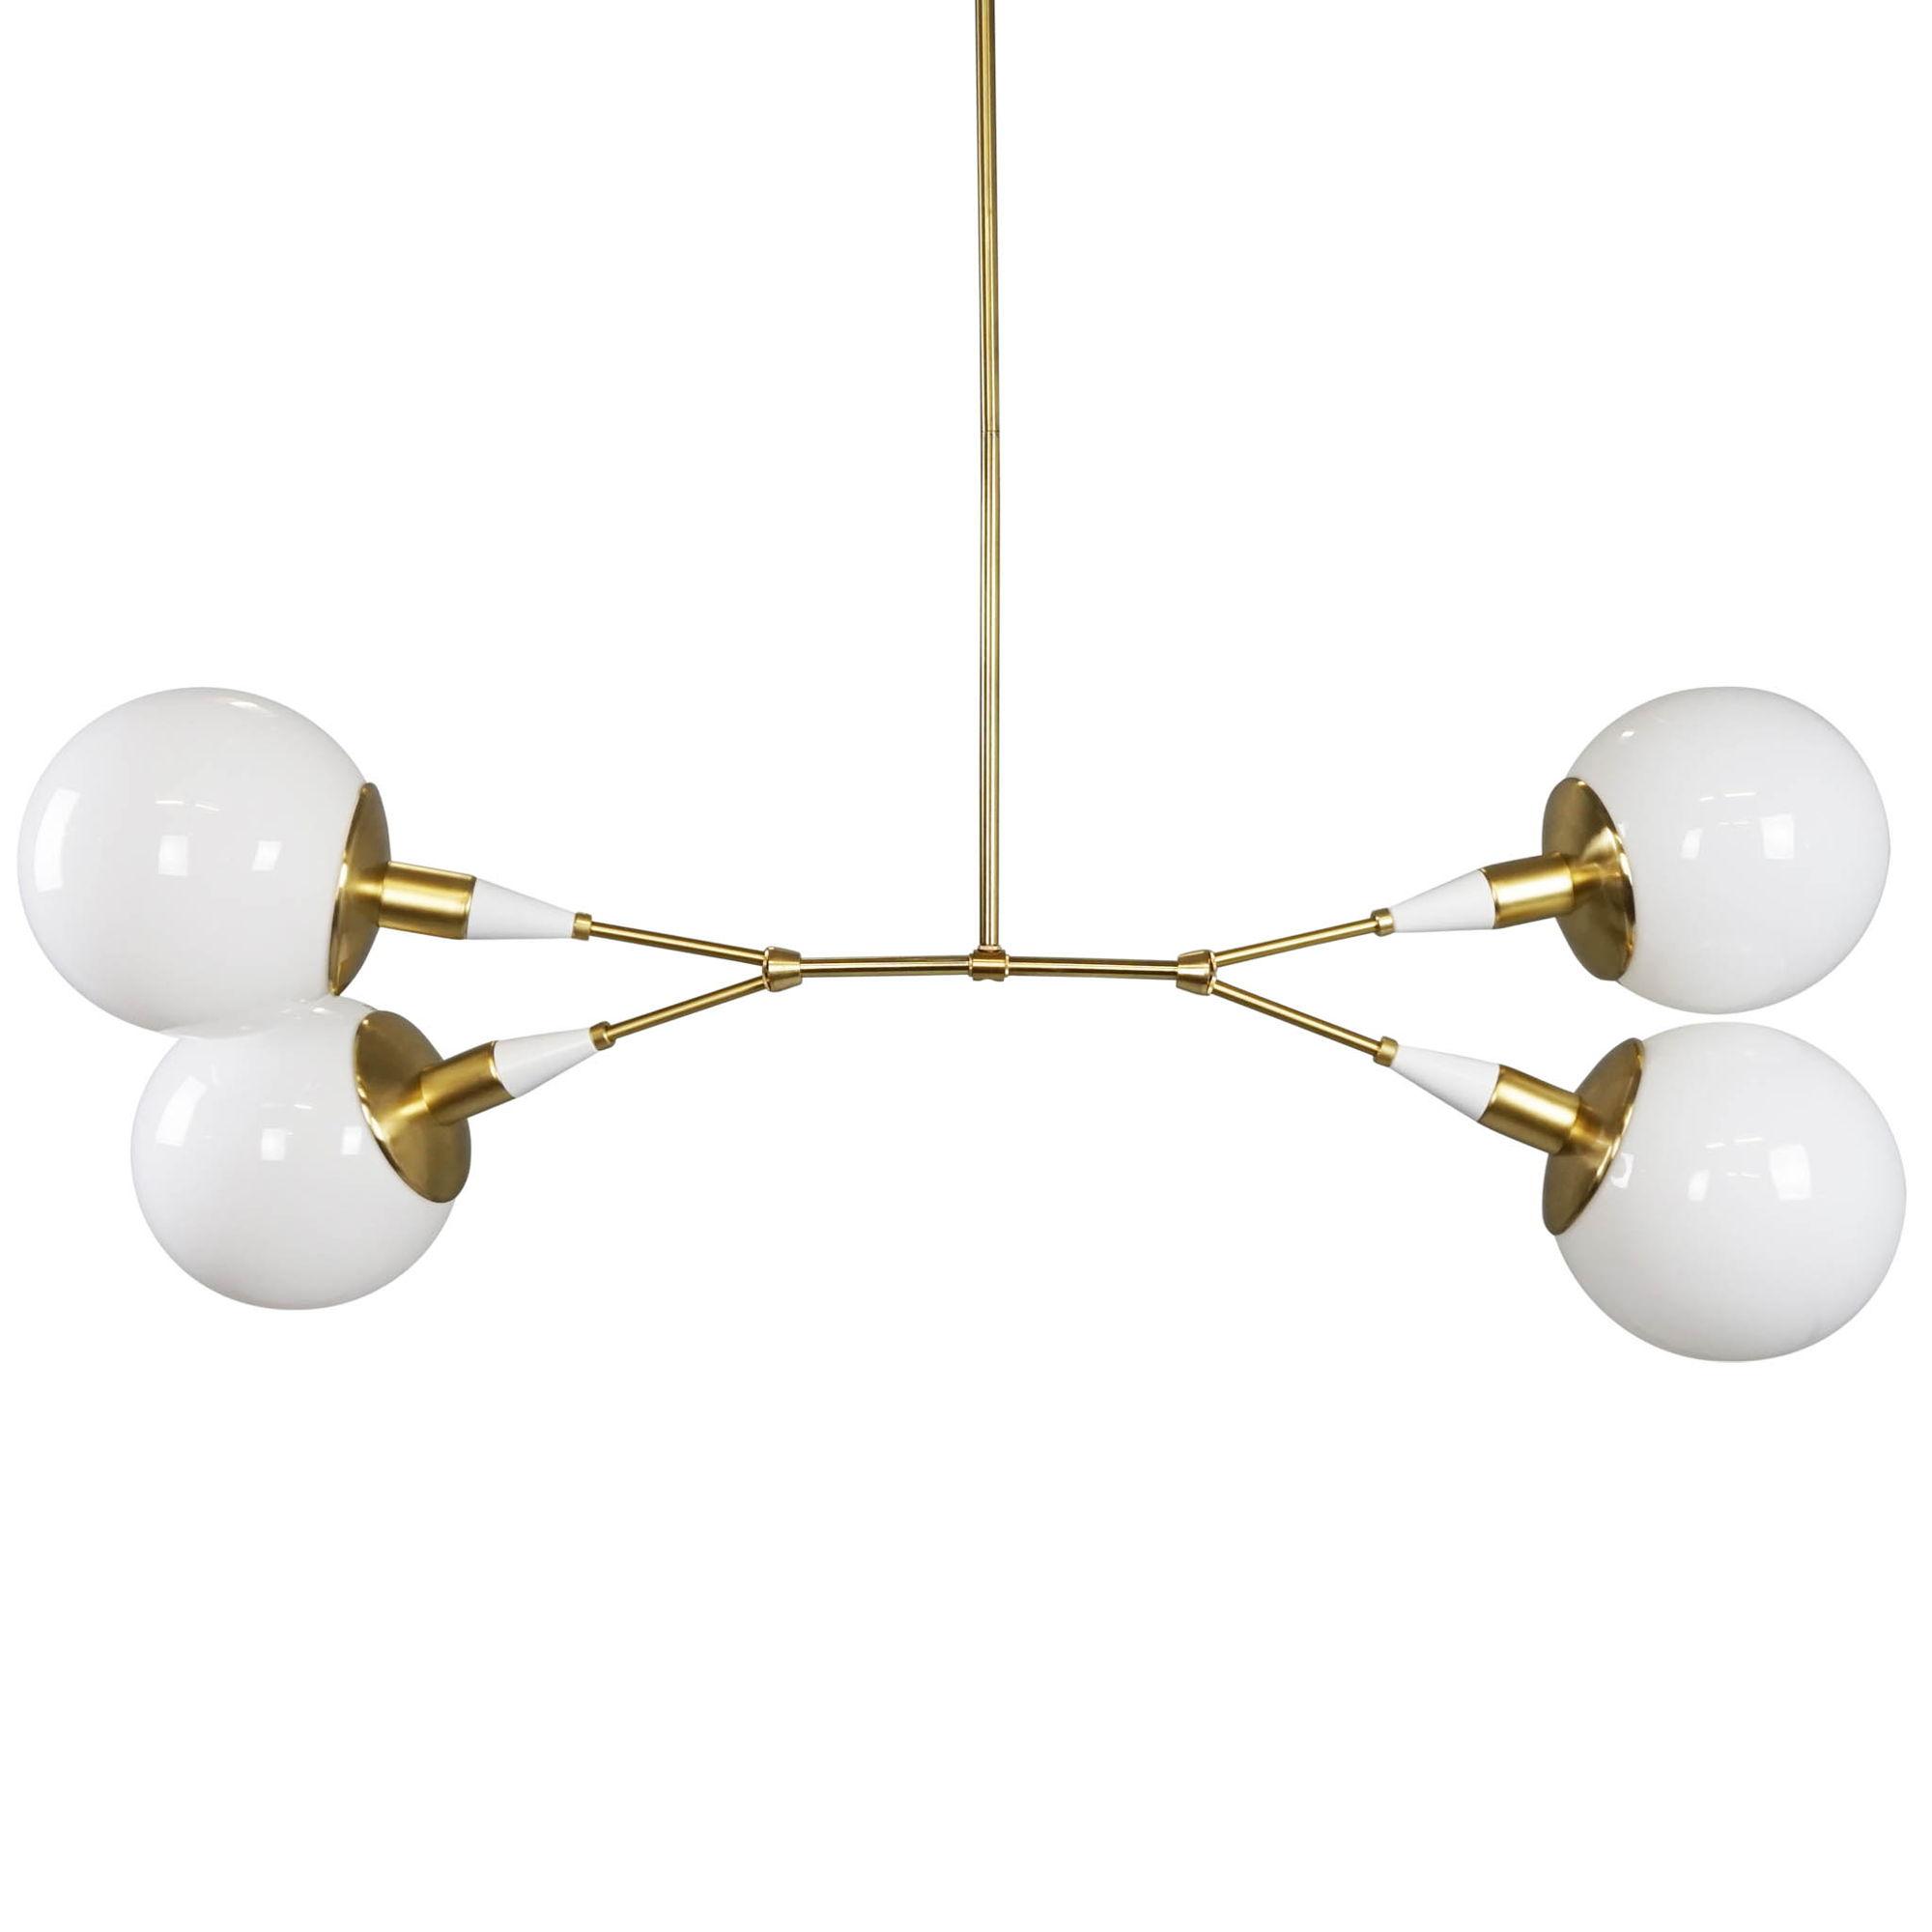 Diviso Globe Chandelier Installation Guide